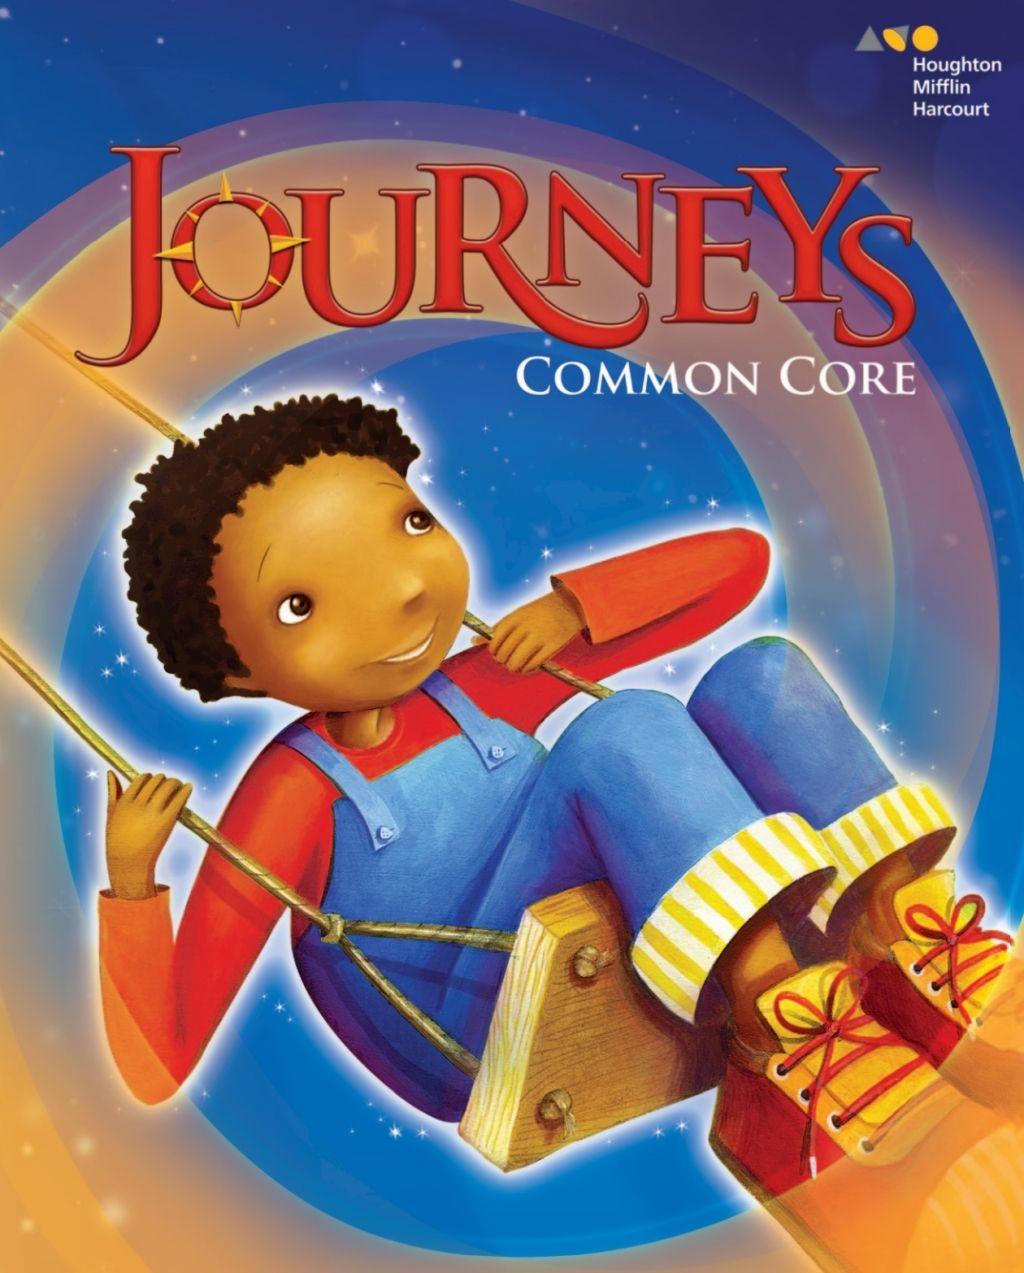 Journeys Common Core Student Edition Digital Content